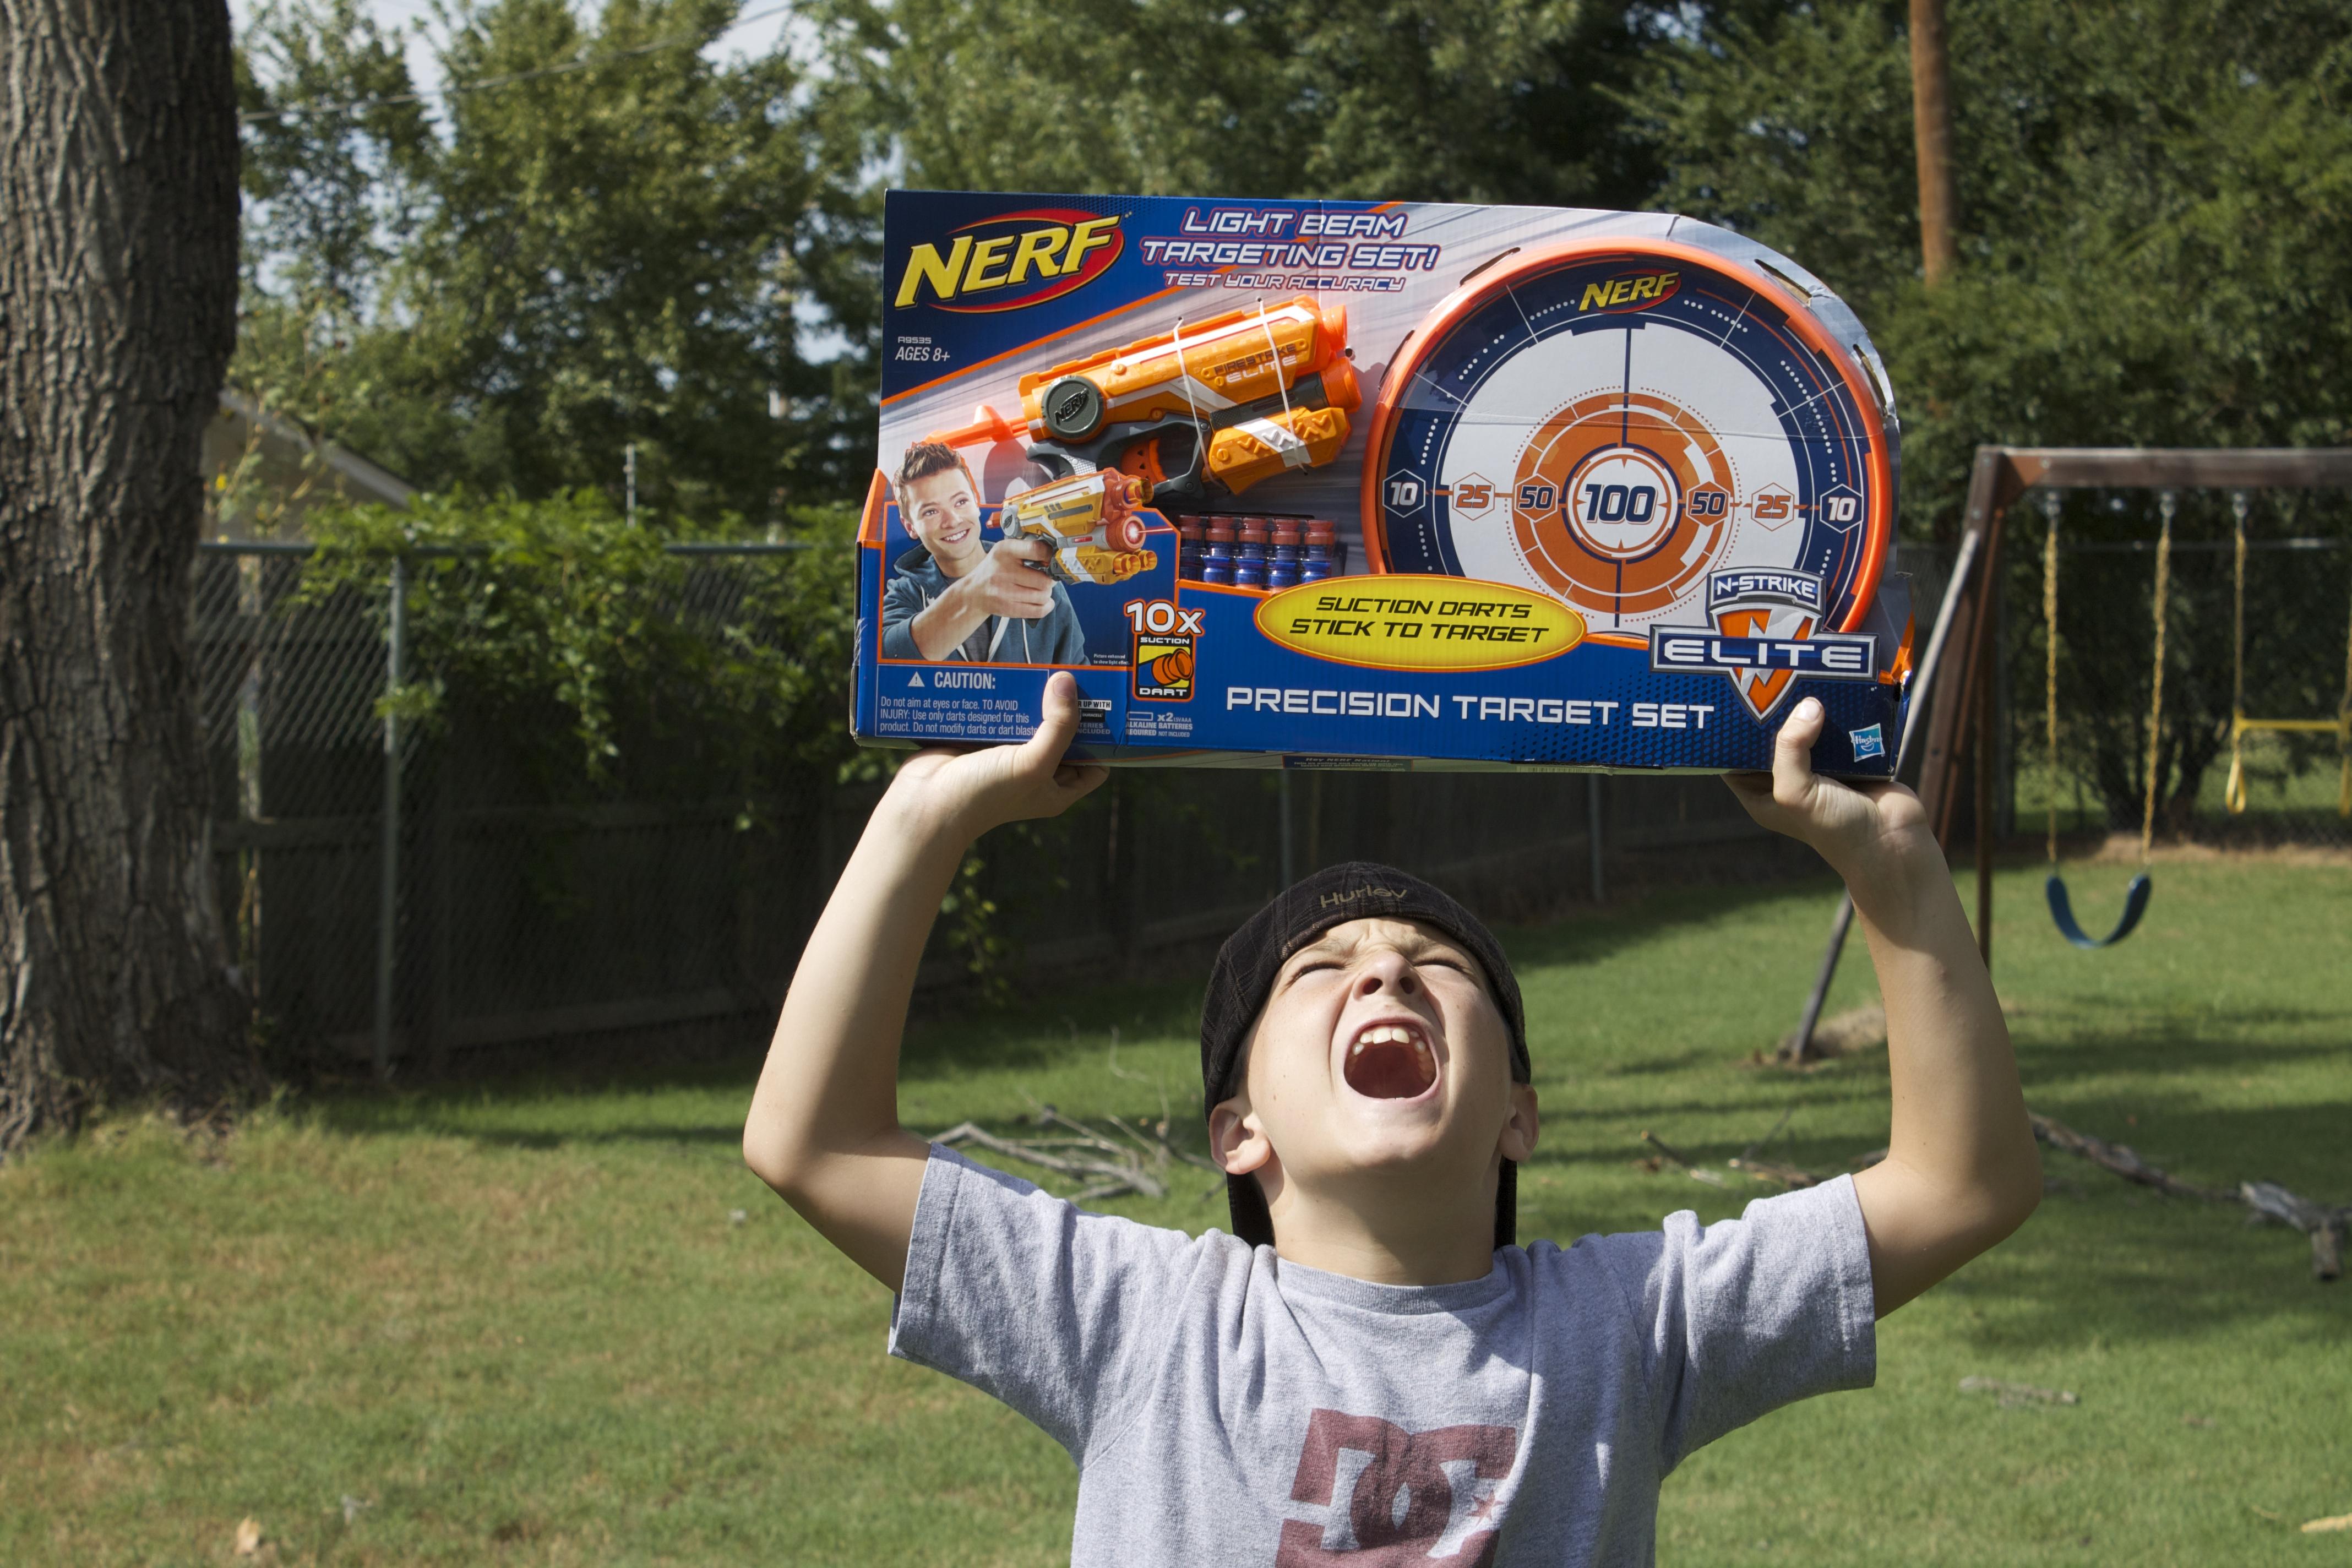 47cm Big Soft Bullet Toy Gun Sniper Rifle Plastic Gun & 20 Bullets 1 Target  Electric Toy Gift N Strike 8 bursts Blaze Storm-in Toy Guns from Toys &  Hobbies ...